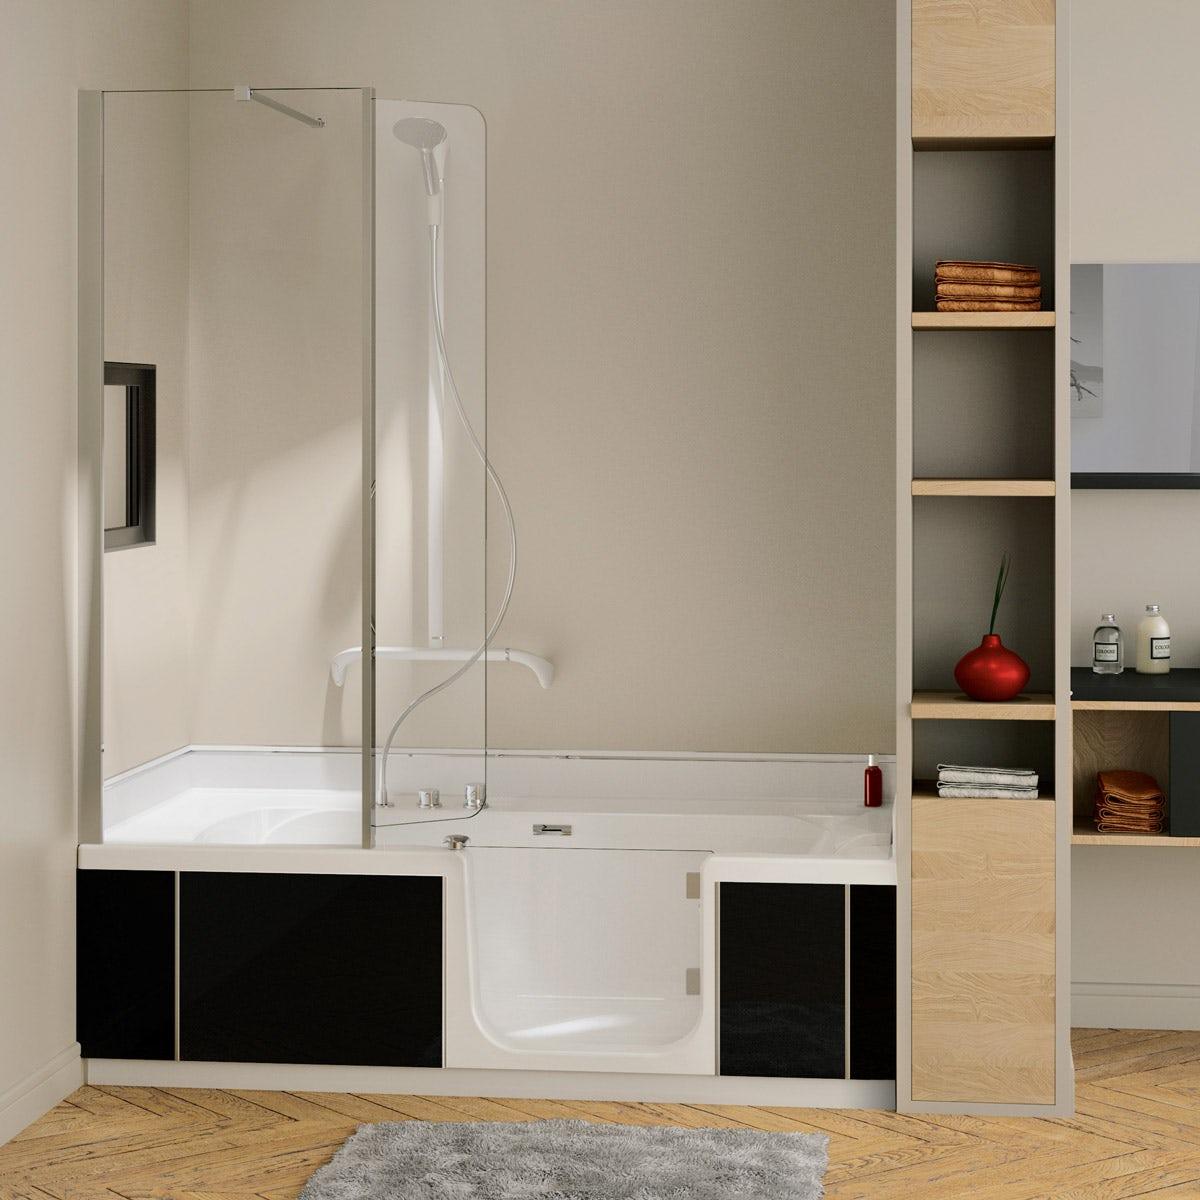 catalogue kinedo catalogue aubade salle de bain meubles. Black Bedroom Furniture Sets. Home Design Ideas